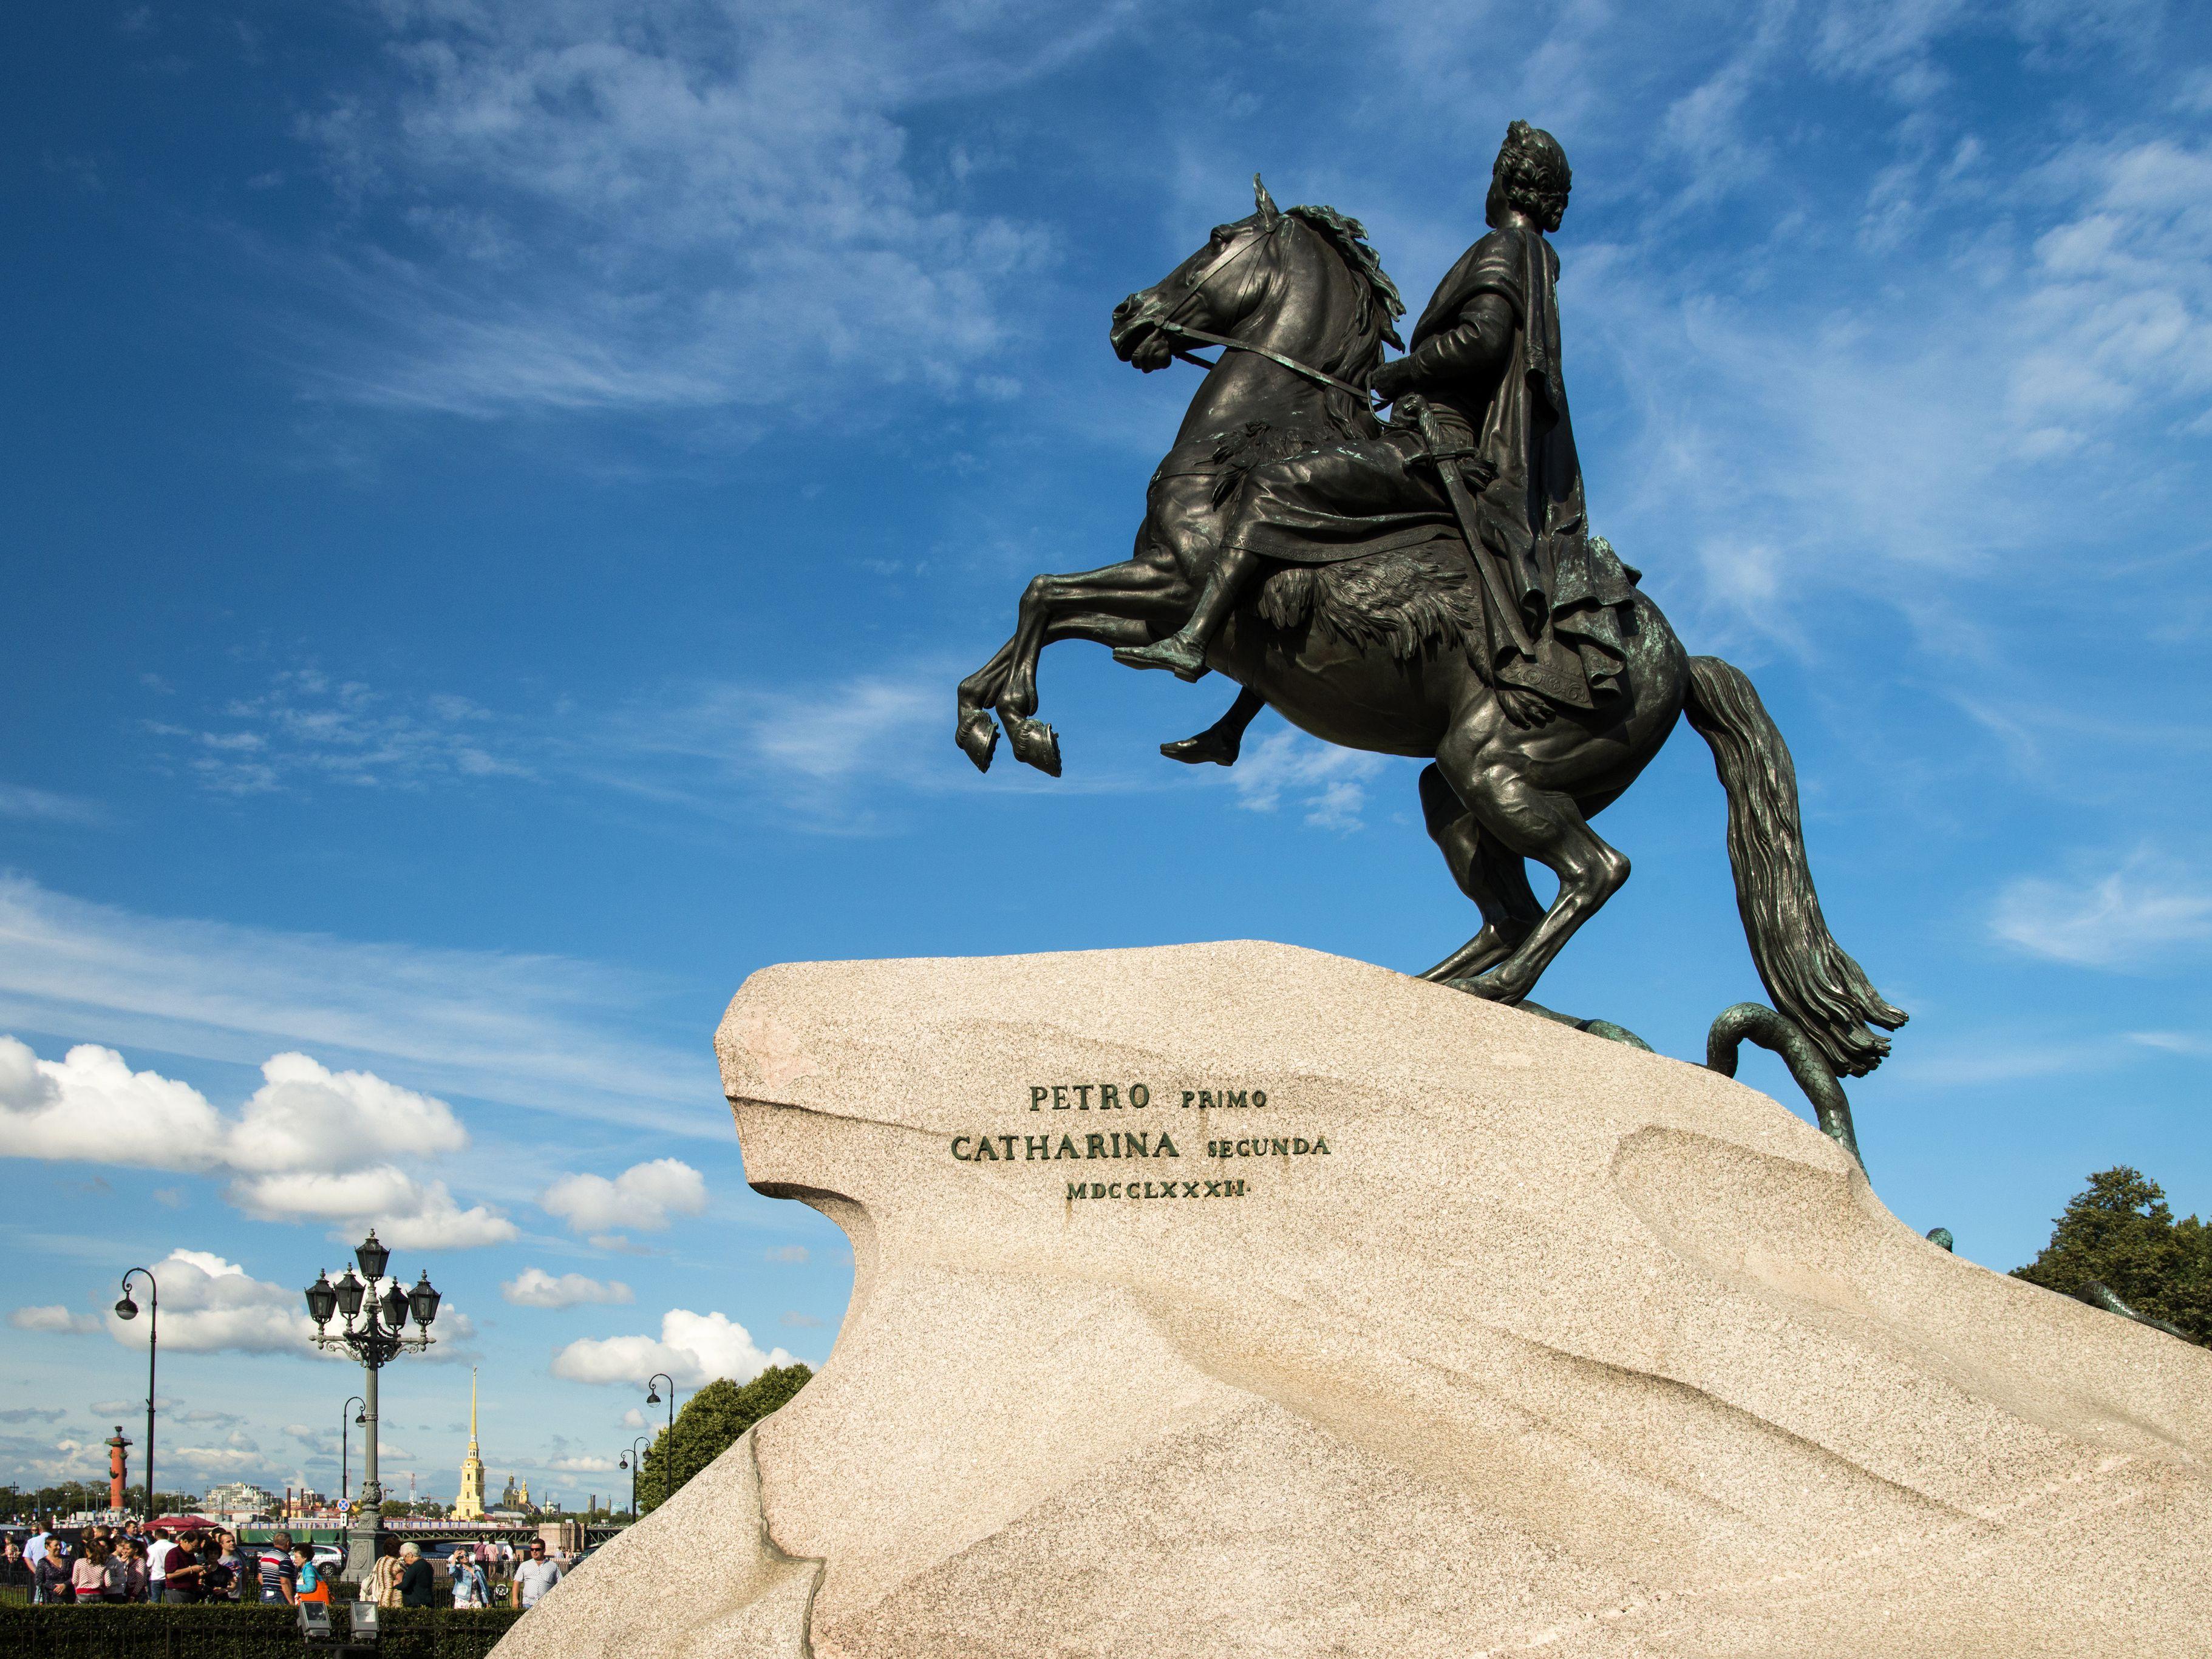 The Bronze Horseman statue of Peter the Great